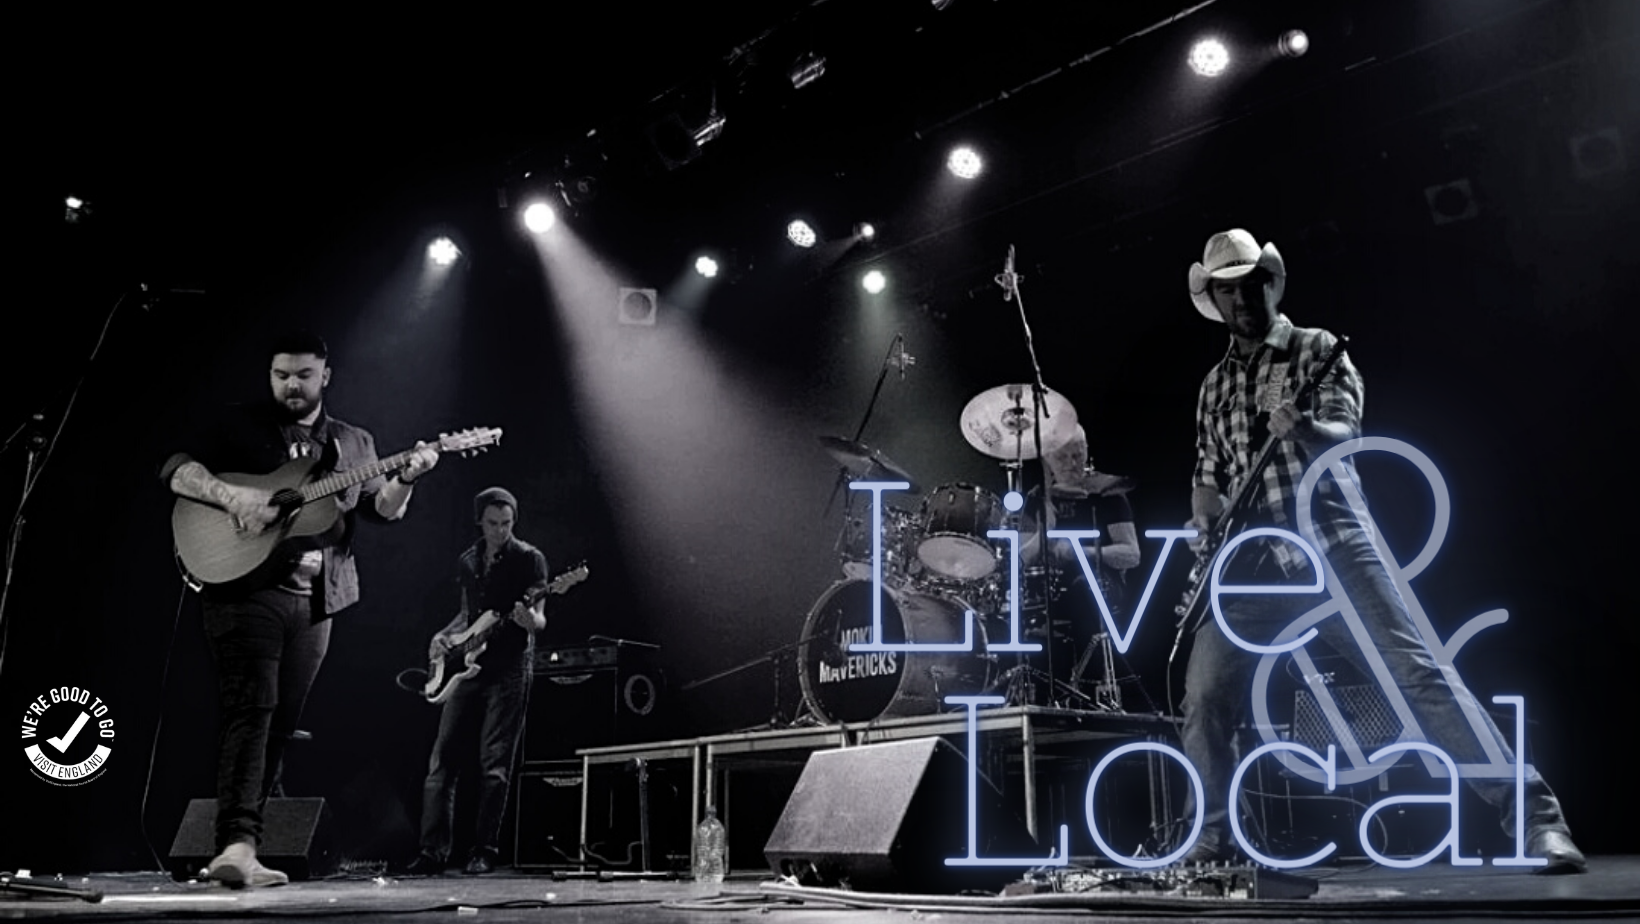 Smokin mavericks band on stage